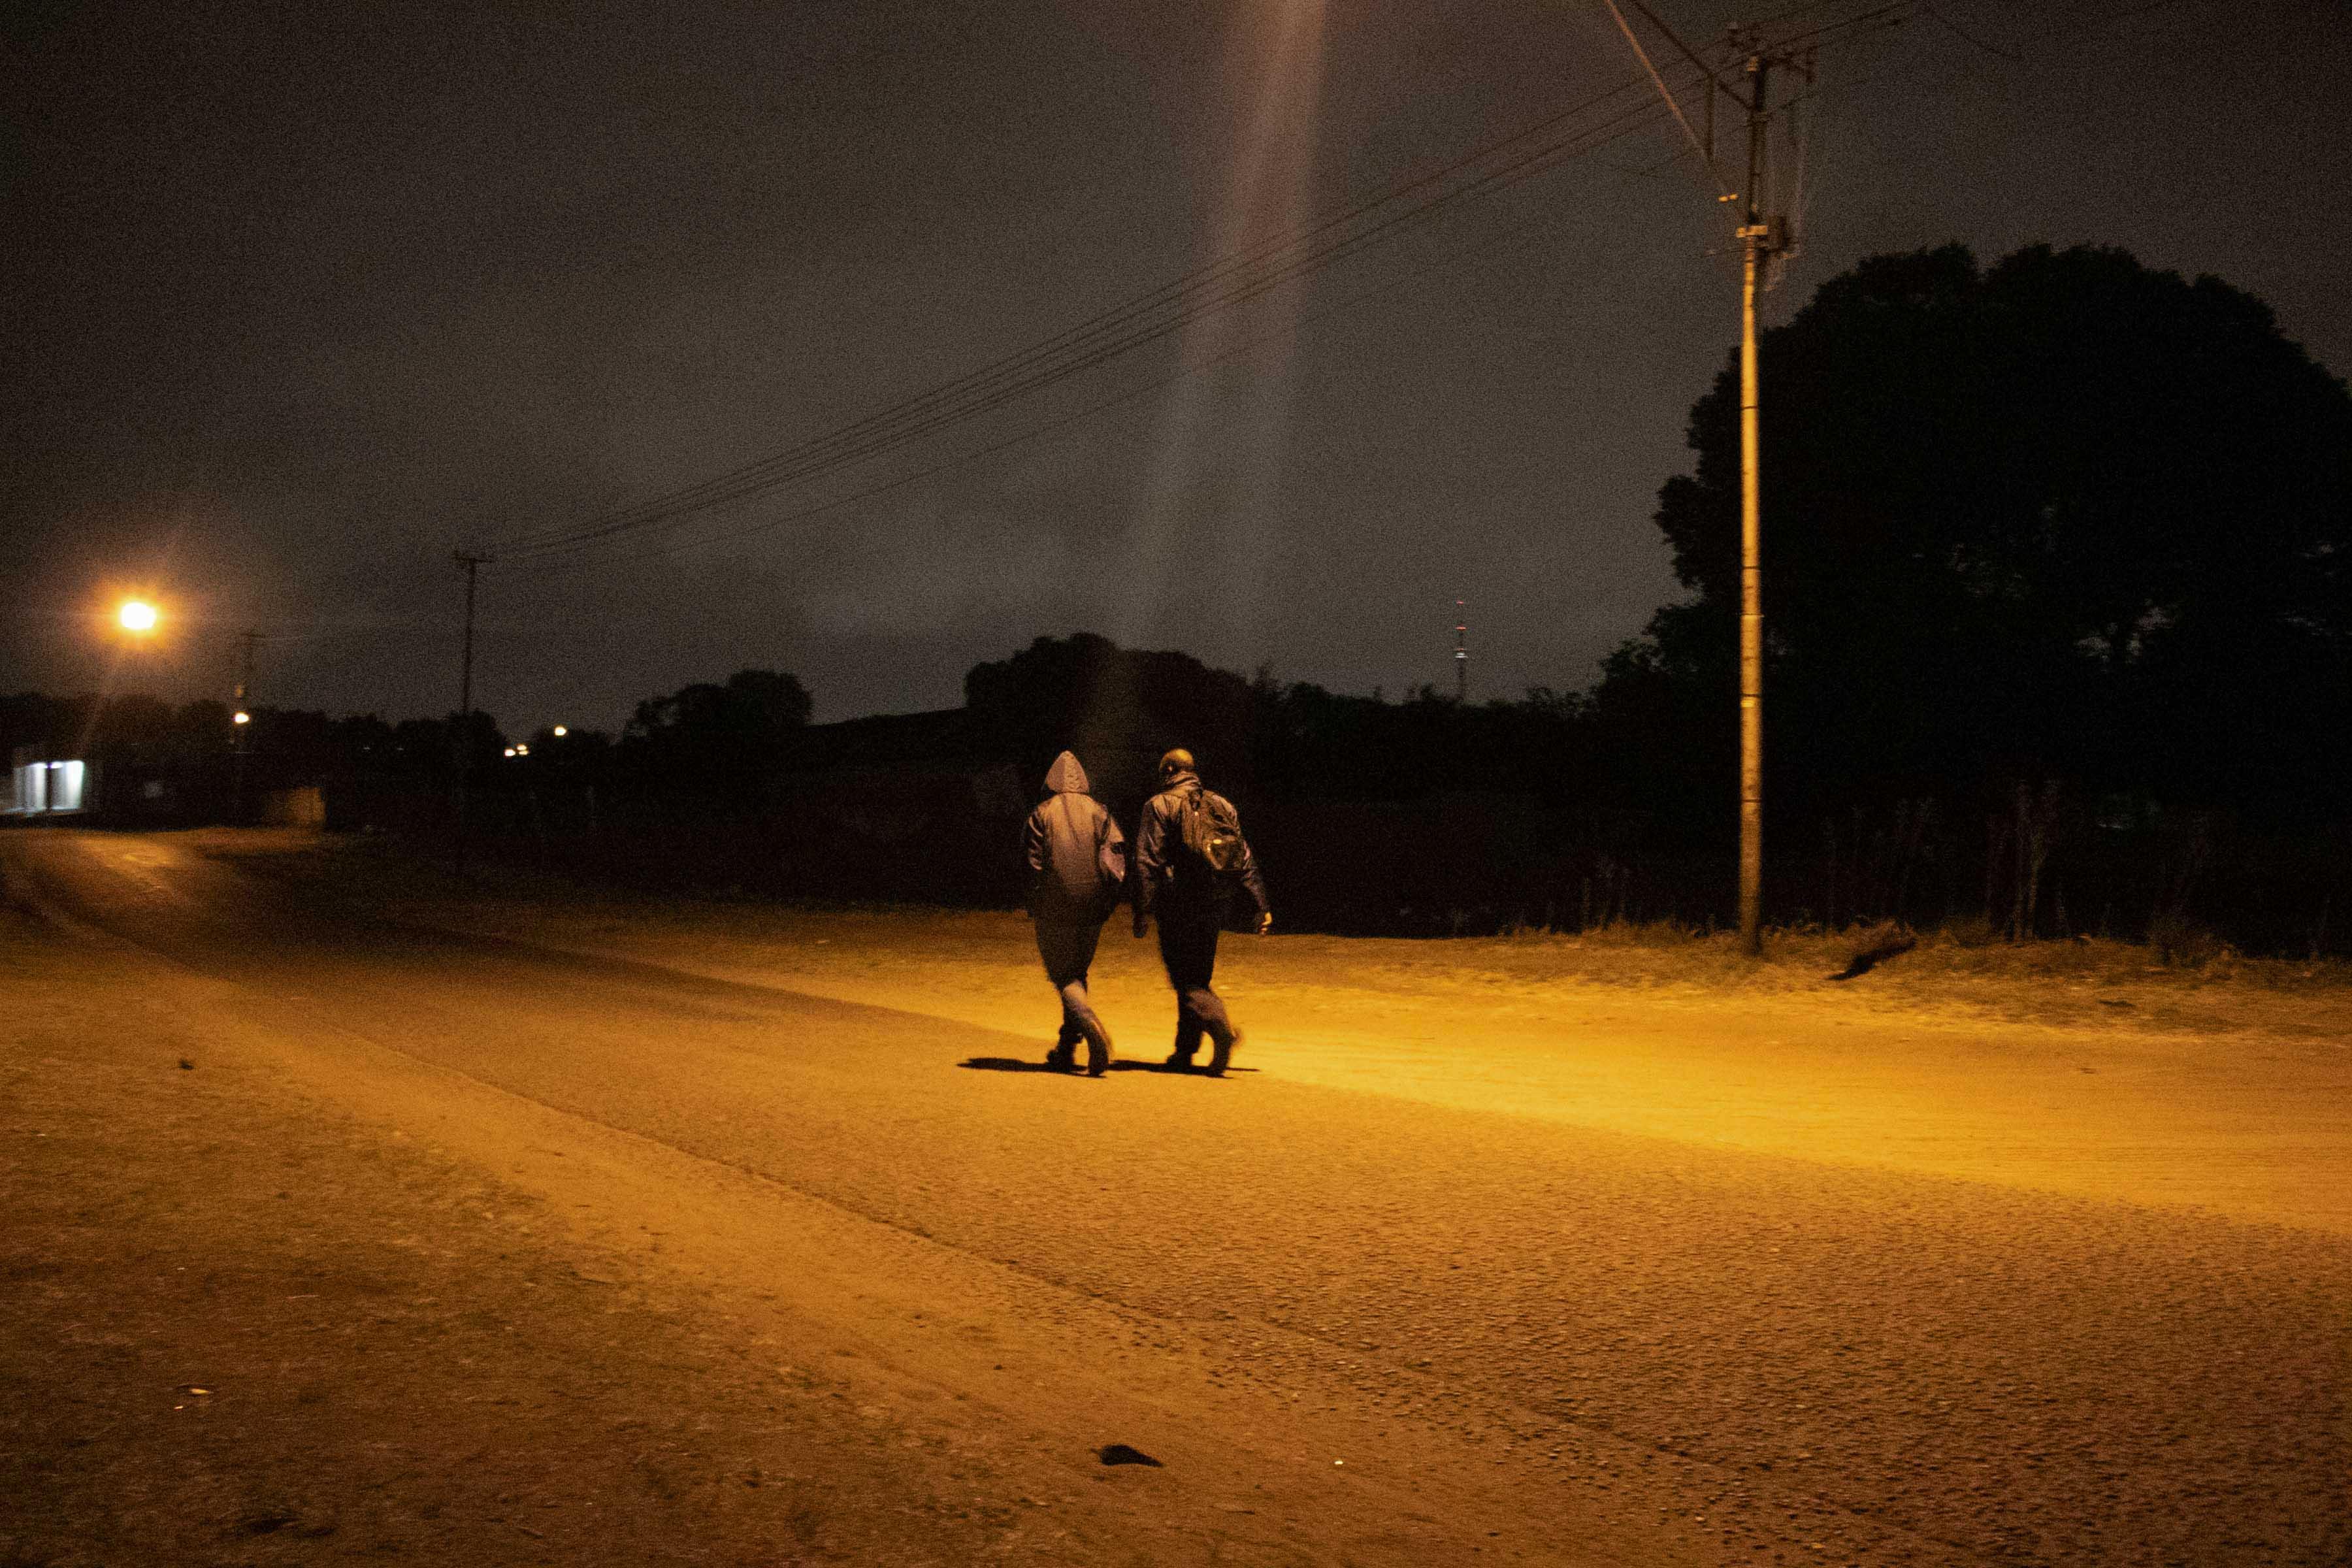 2 October 2019: Edmond Patrick Ndlovu and his housemate, Emmanuel, walking to the Langlaagte station.